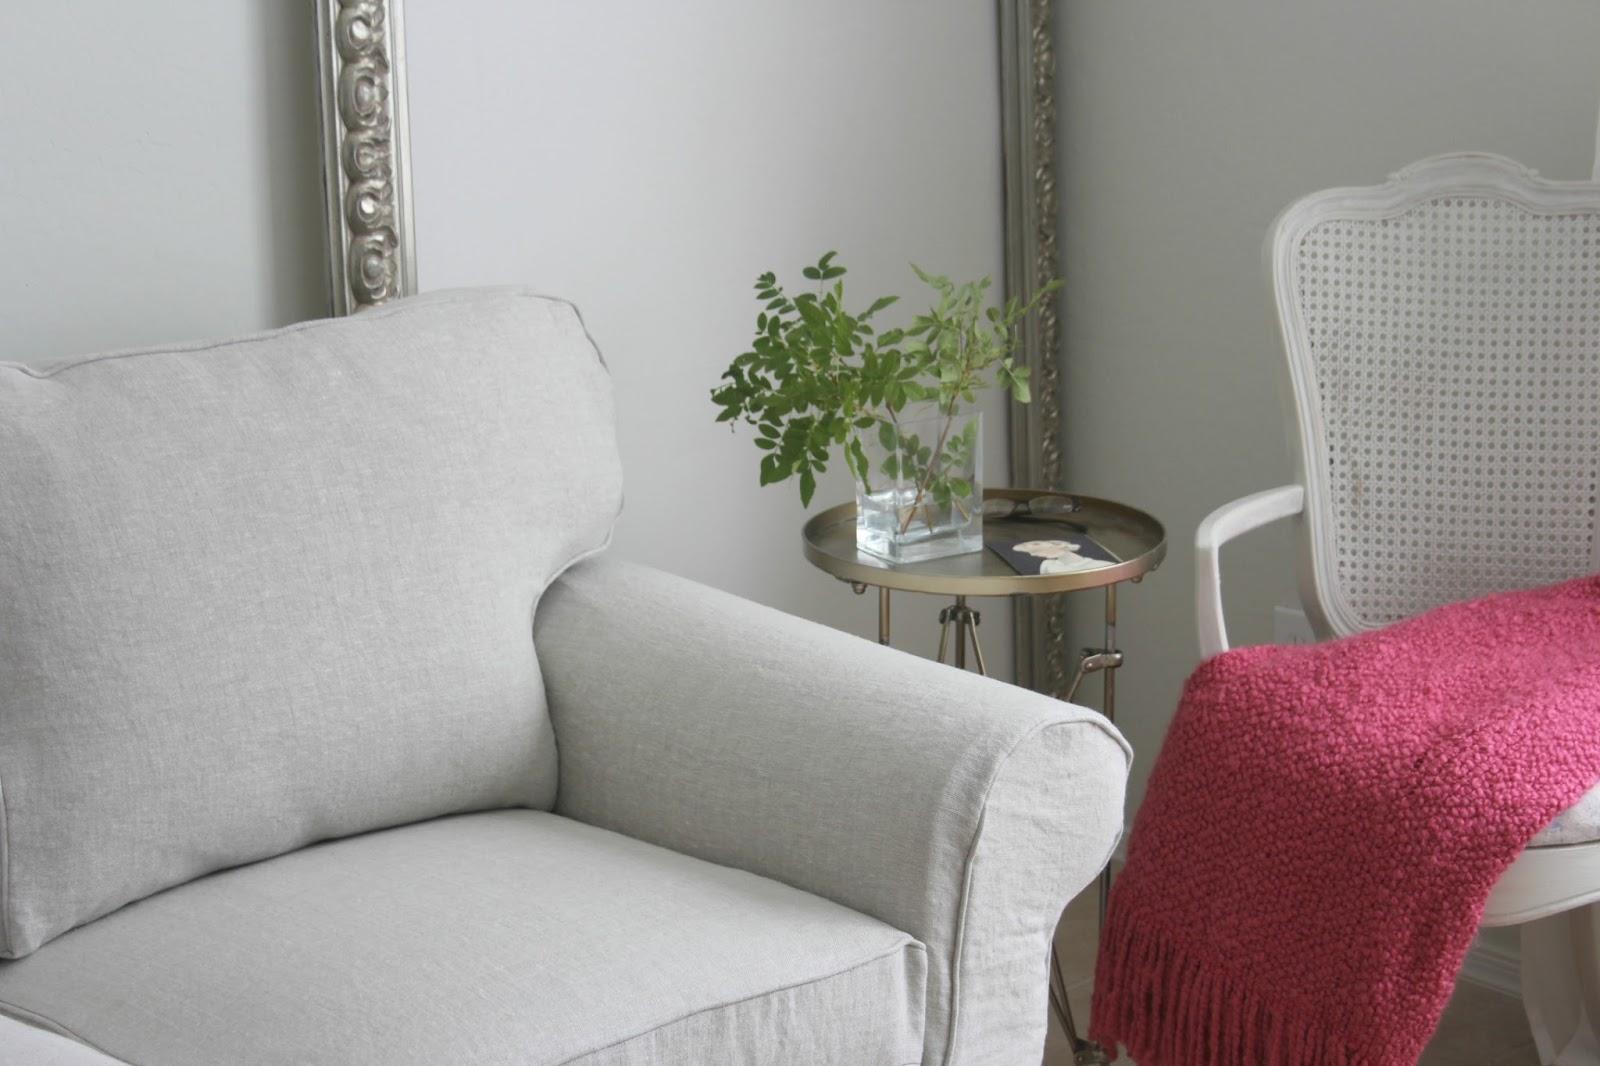 belgian linen sofa black sectional craigslist my ektorp sofas get a luxurious ikea hack from bemz